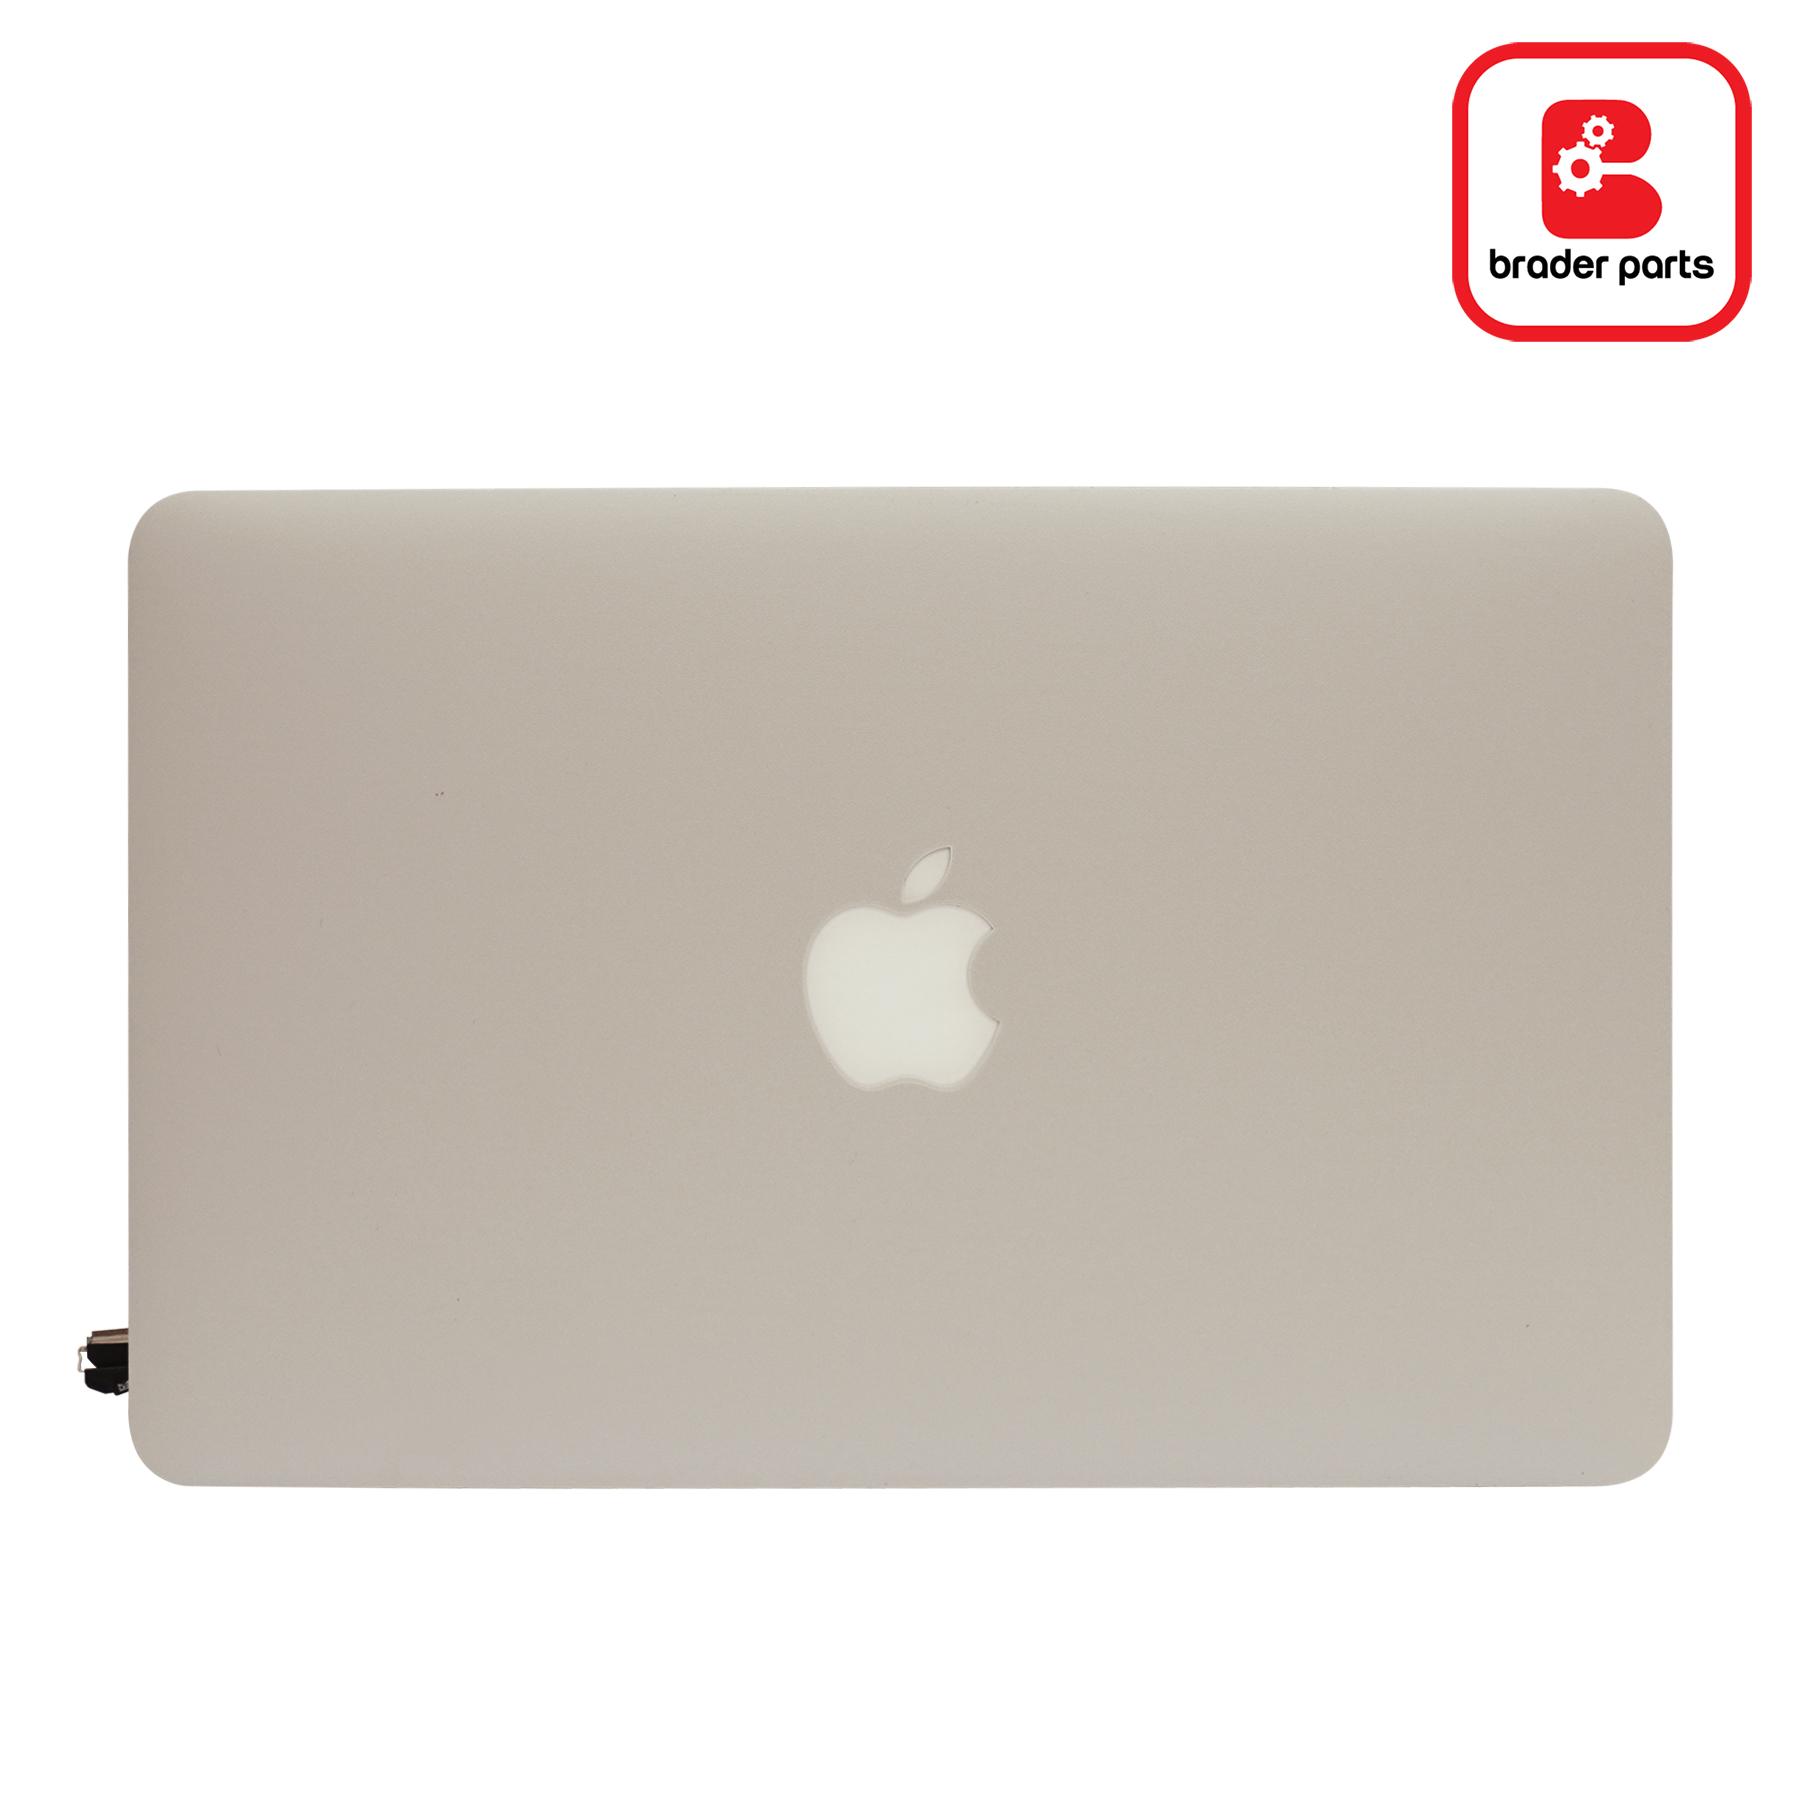 "Lcd Macbook Air 11"" A1465 Mid 2013 Original front"